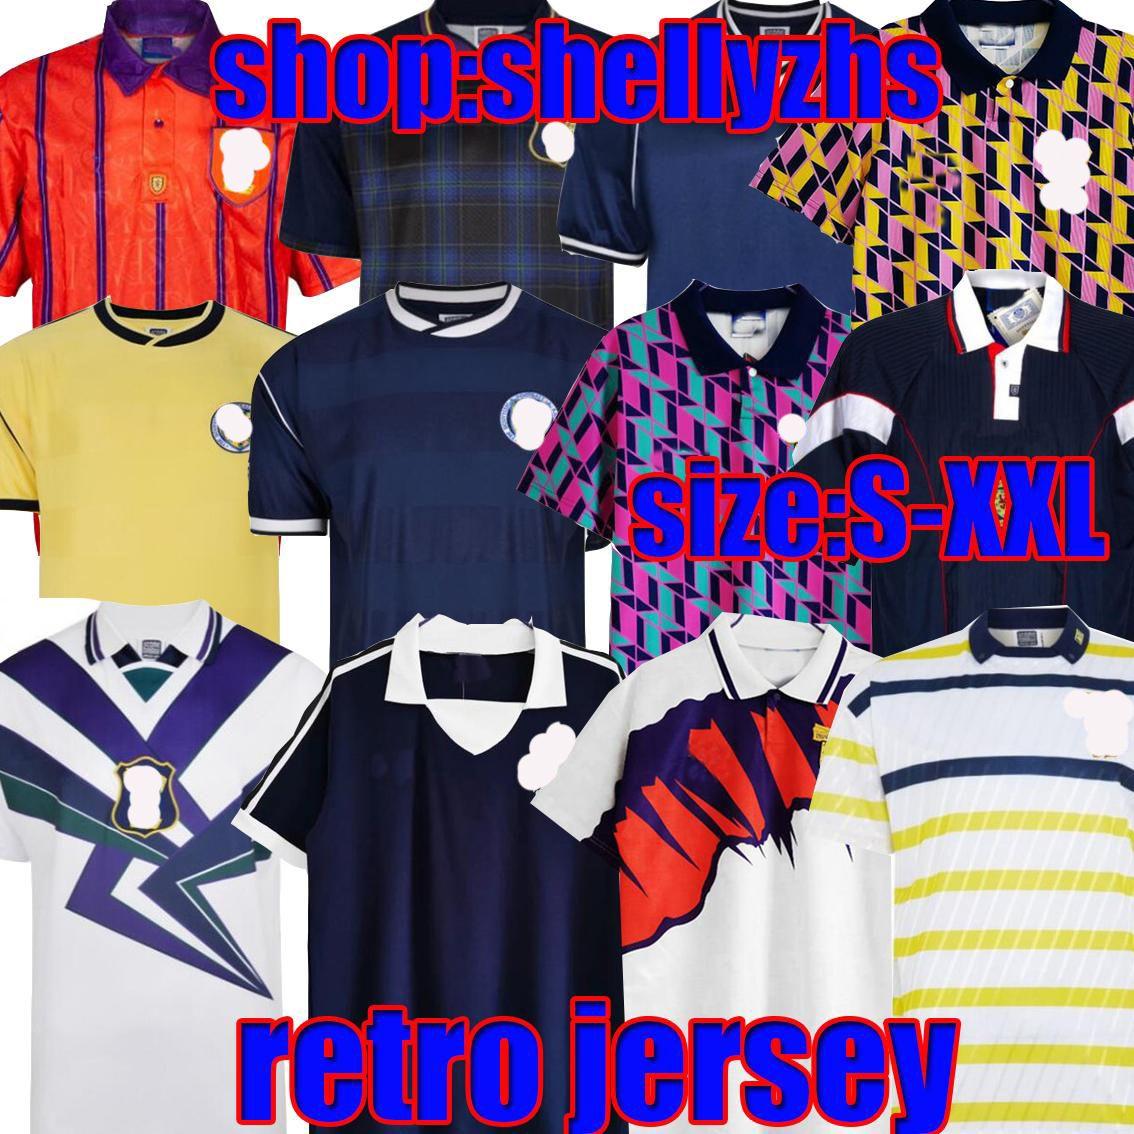 1986 1991 1993 94 1988 1989 91 93 95 96 98 99 00 Maillots Classic Vintage Vintage Hendry Lambert Football Shirt